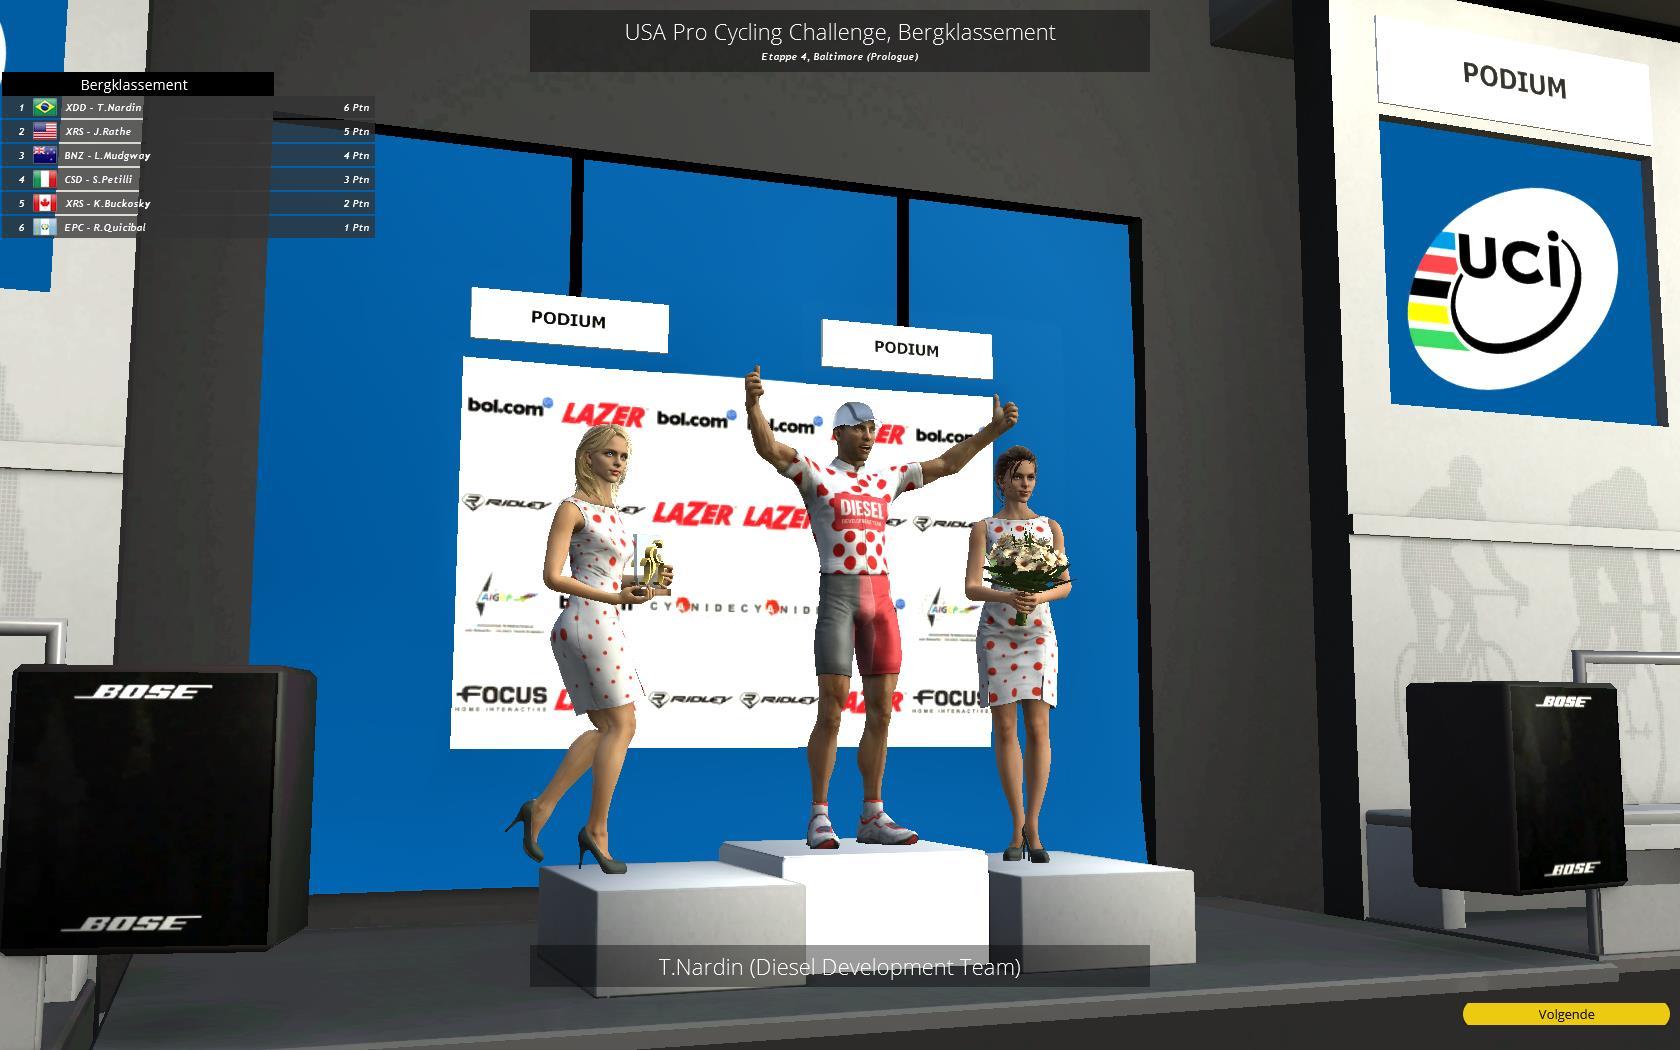 pcmdaily.com/images/mg/2018/Races/C2/USAPCC/4/PCM0044.jpg